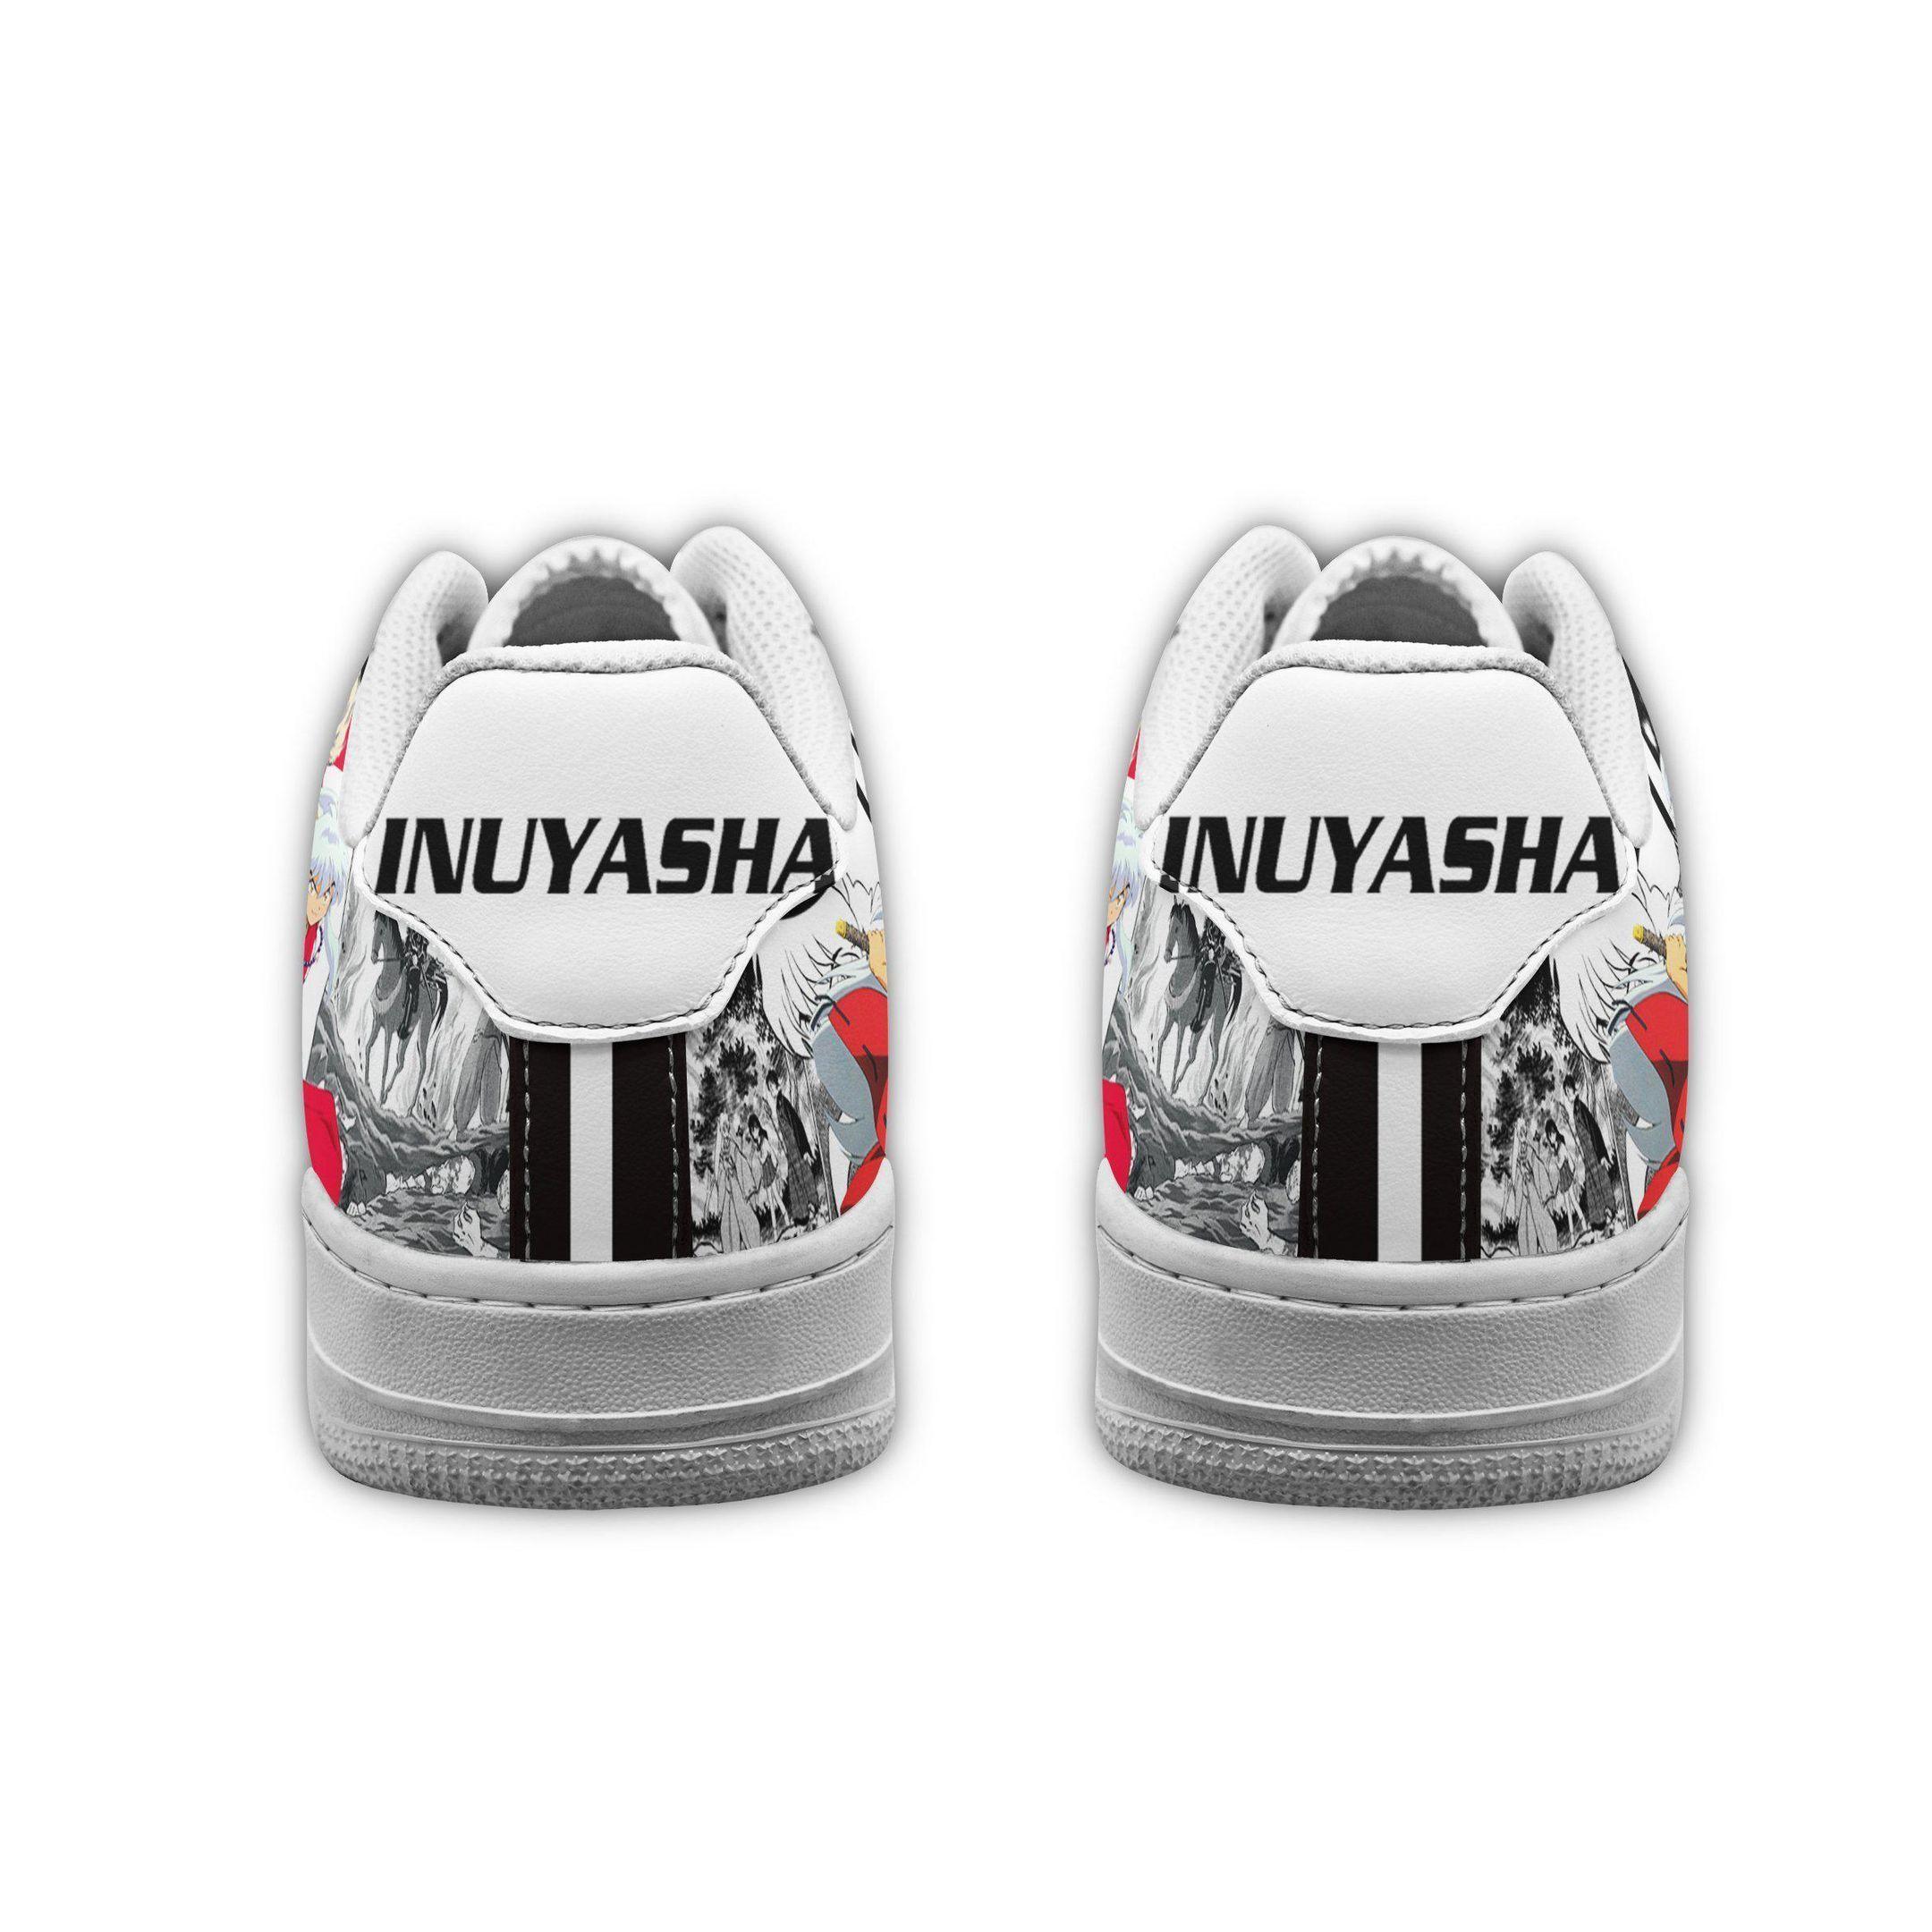 Inuyasha Air Shoes Manga Anime Shoes Fan Gift Idea GO1012